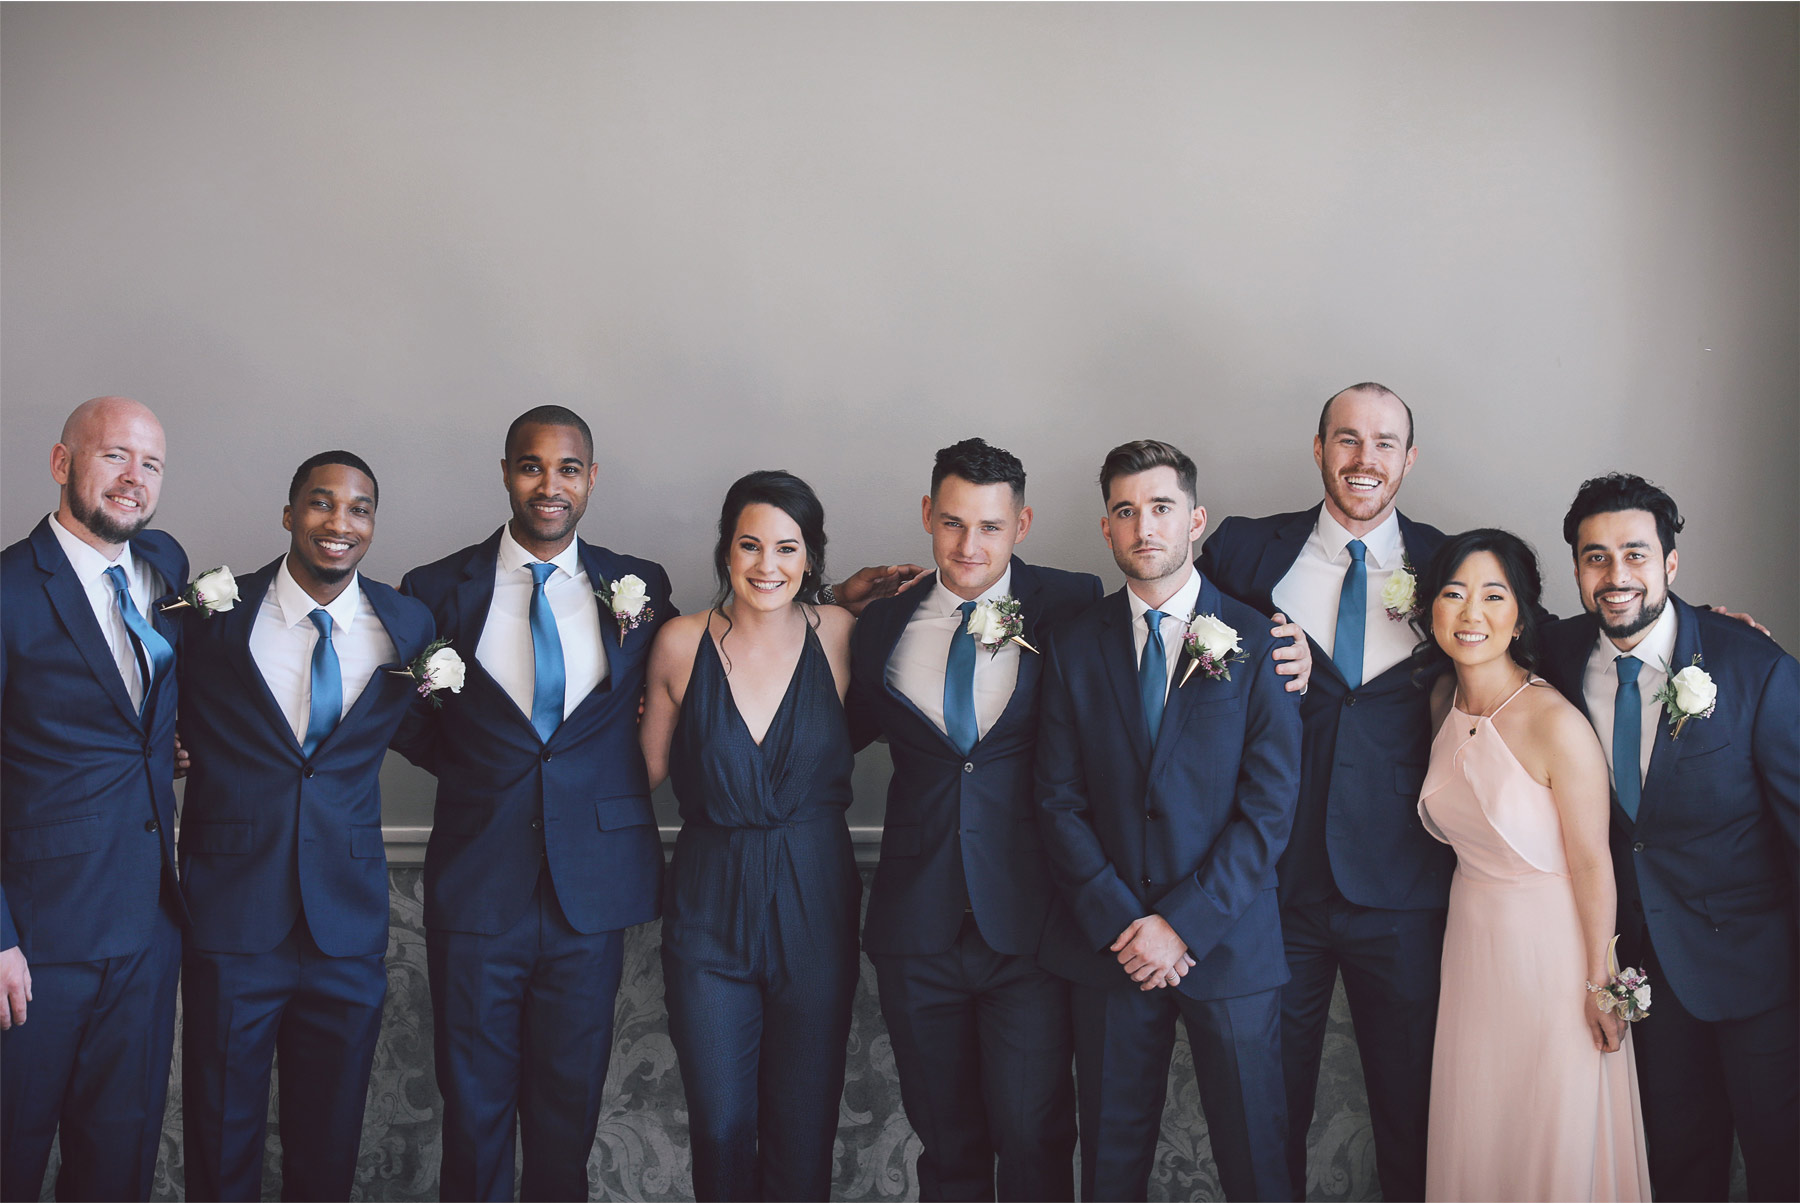 07-Minneapolis-Minnesota-Wedding-Andrew-Vick-Photography-Calhoun-Beach-Club-Groom-Groomsmen-Wedding-Party-Samantha-and-Ryan.jpg